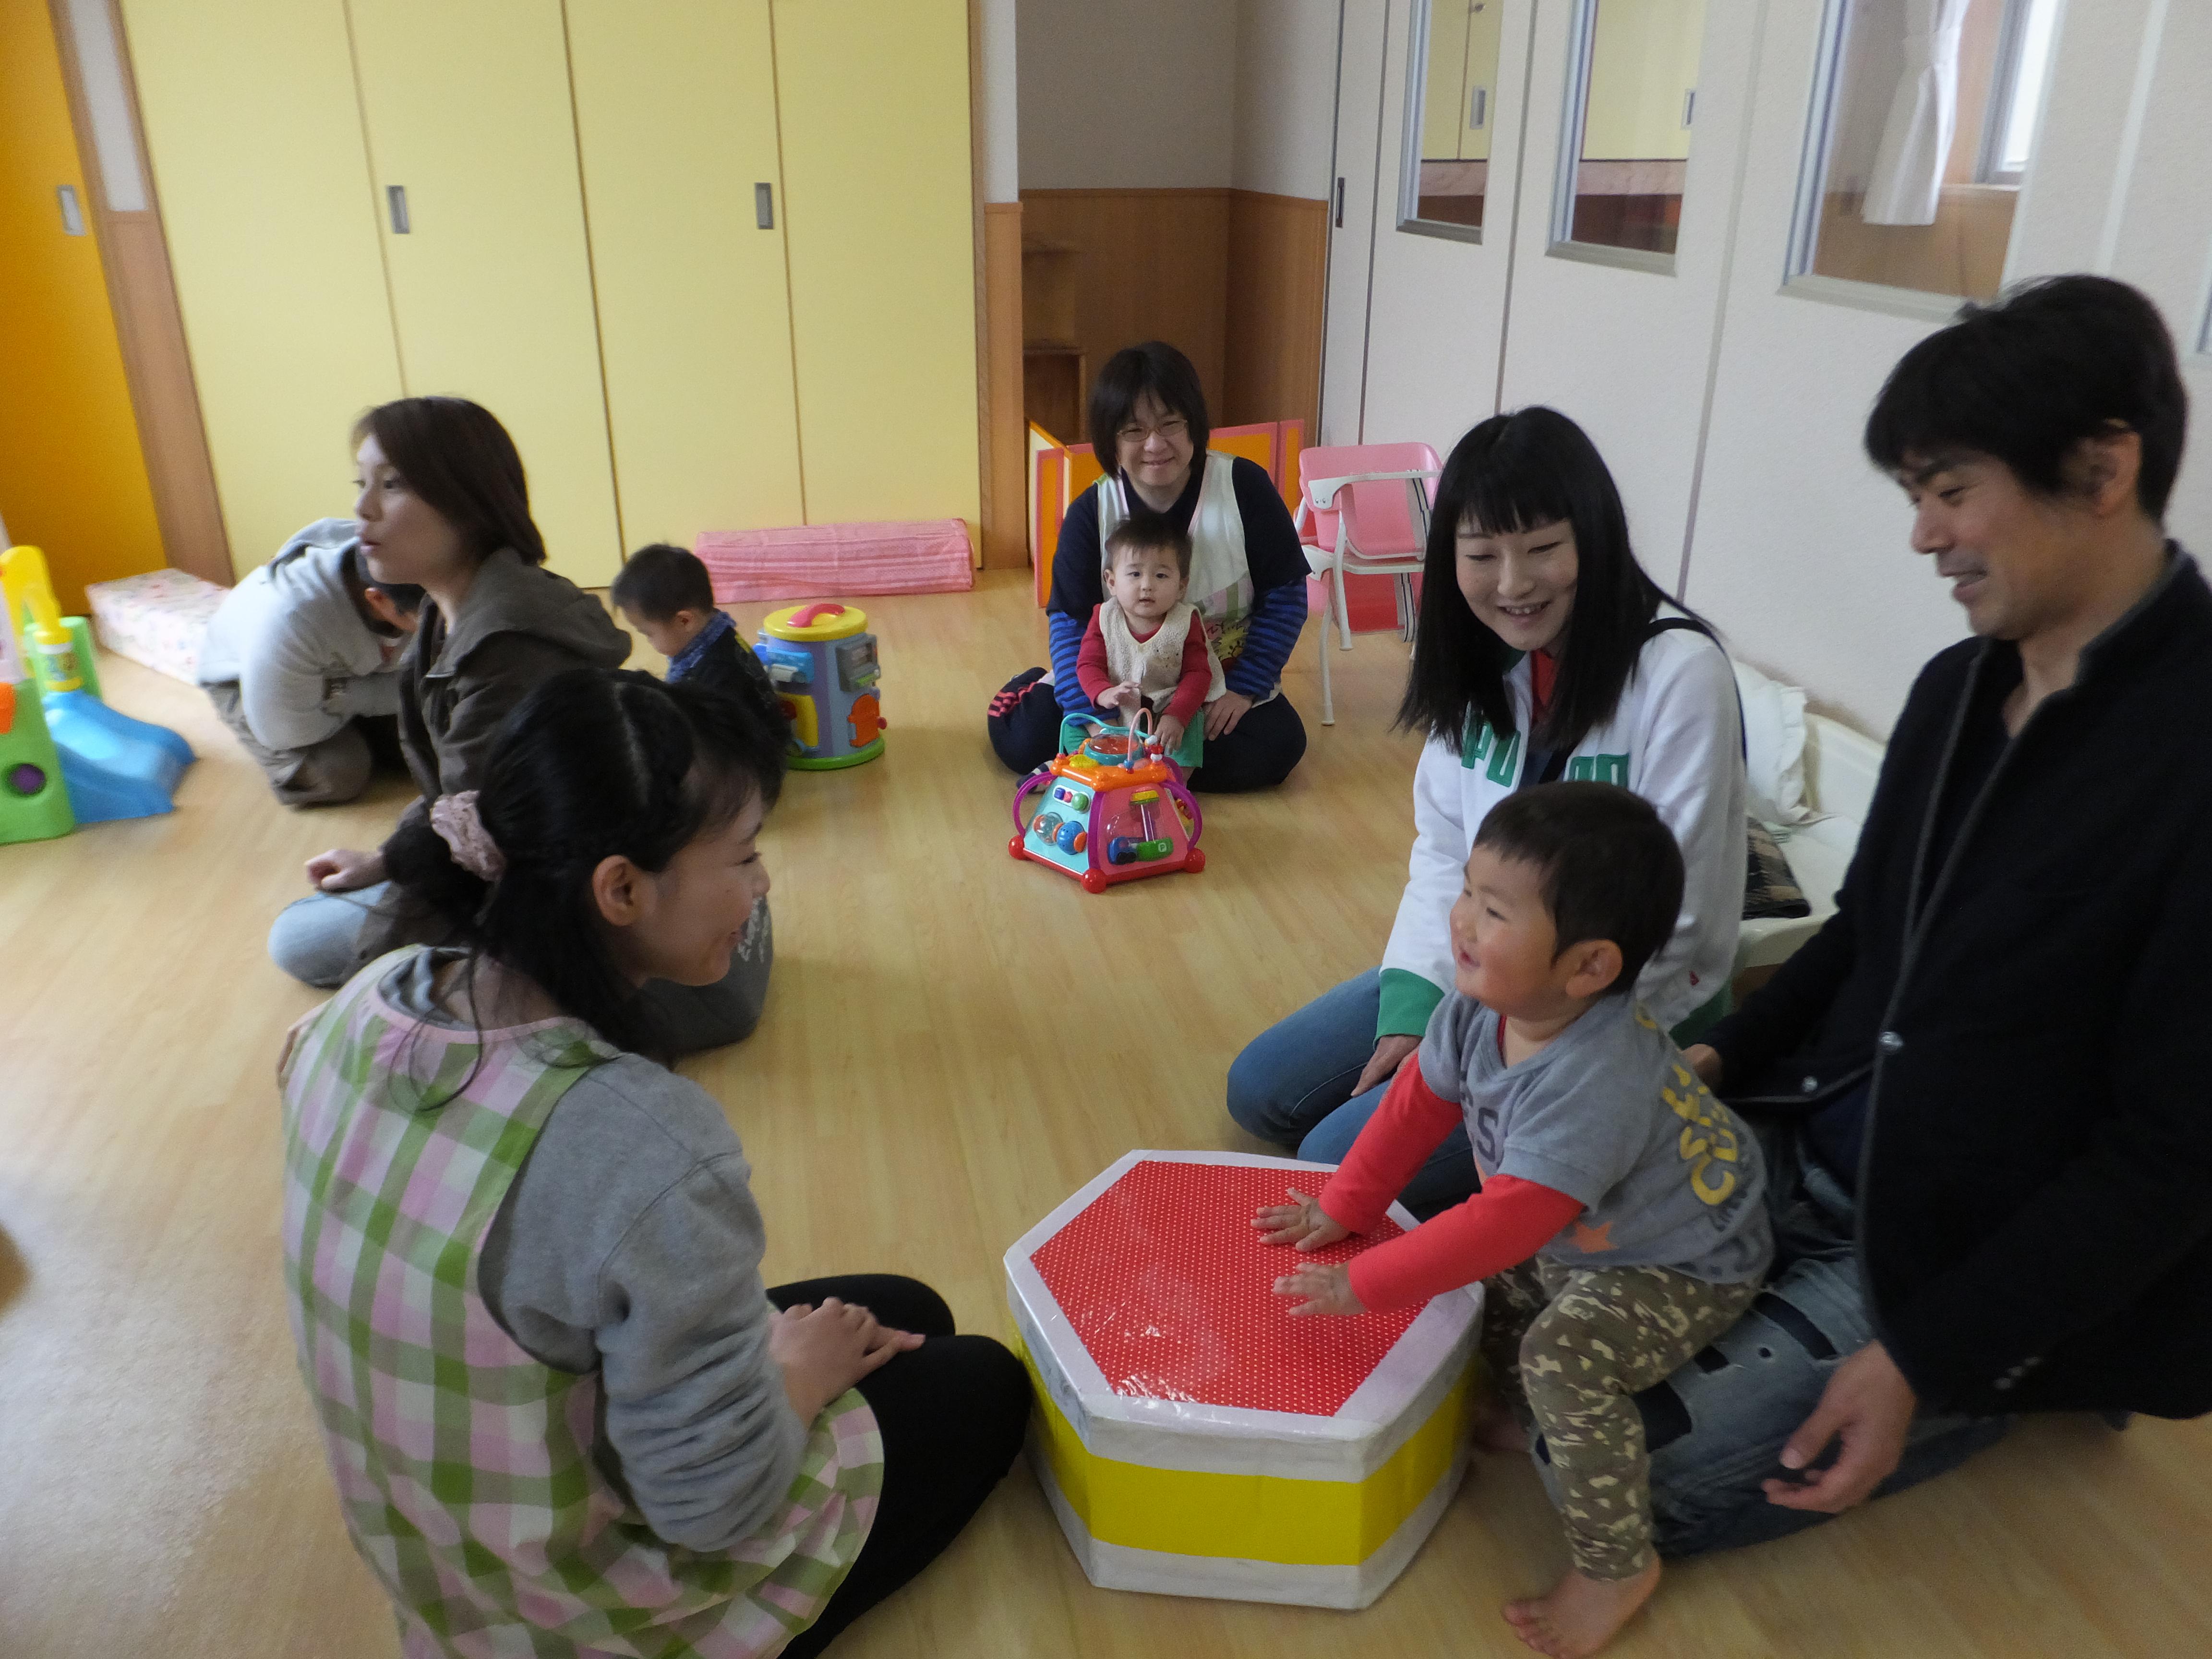 2015.04.11-4gatu-sannkannkai-034